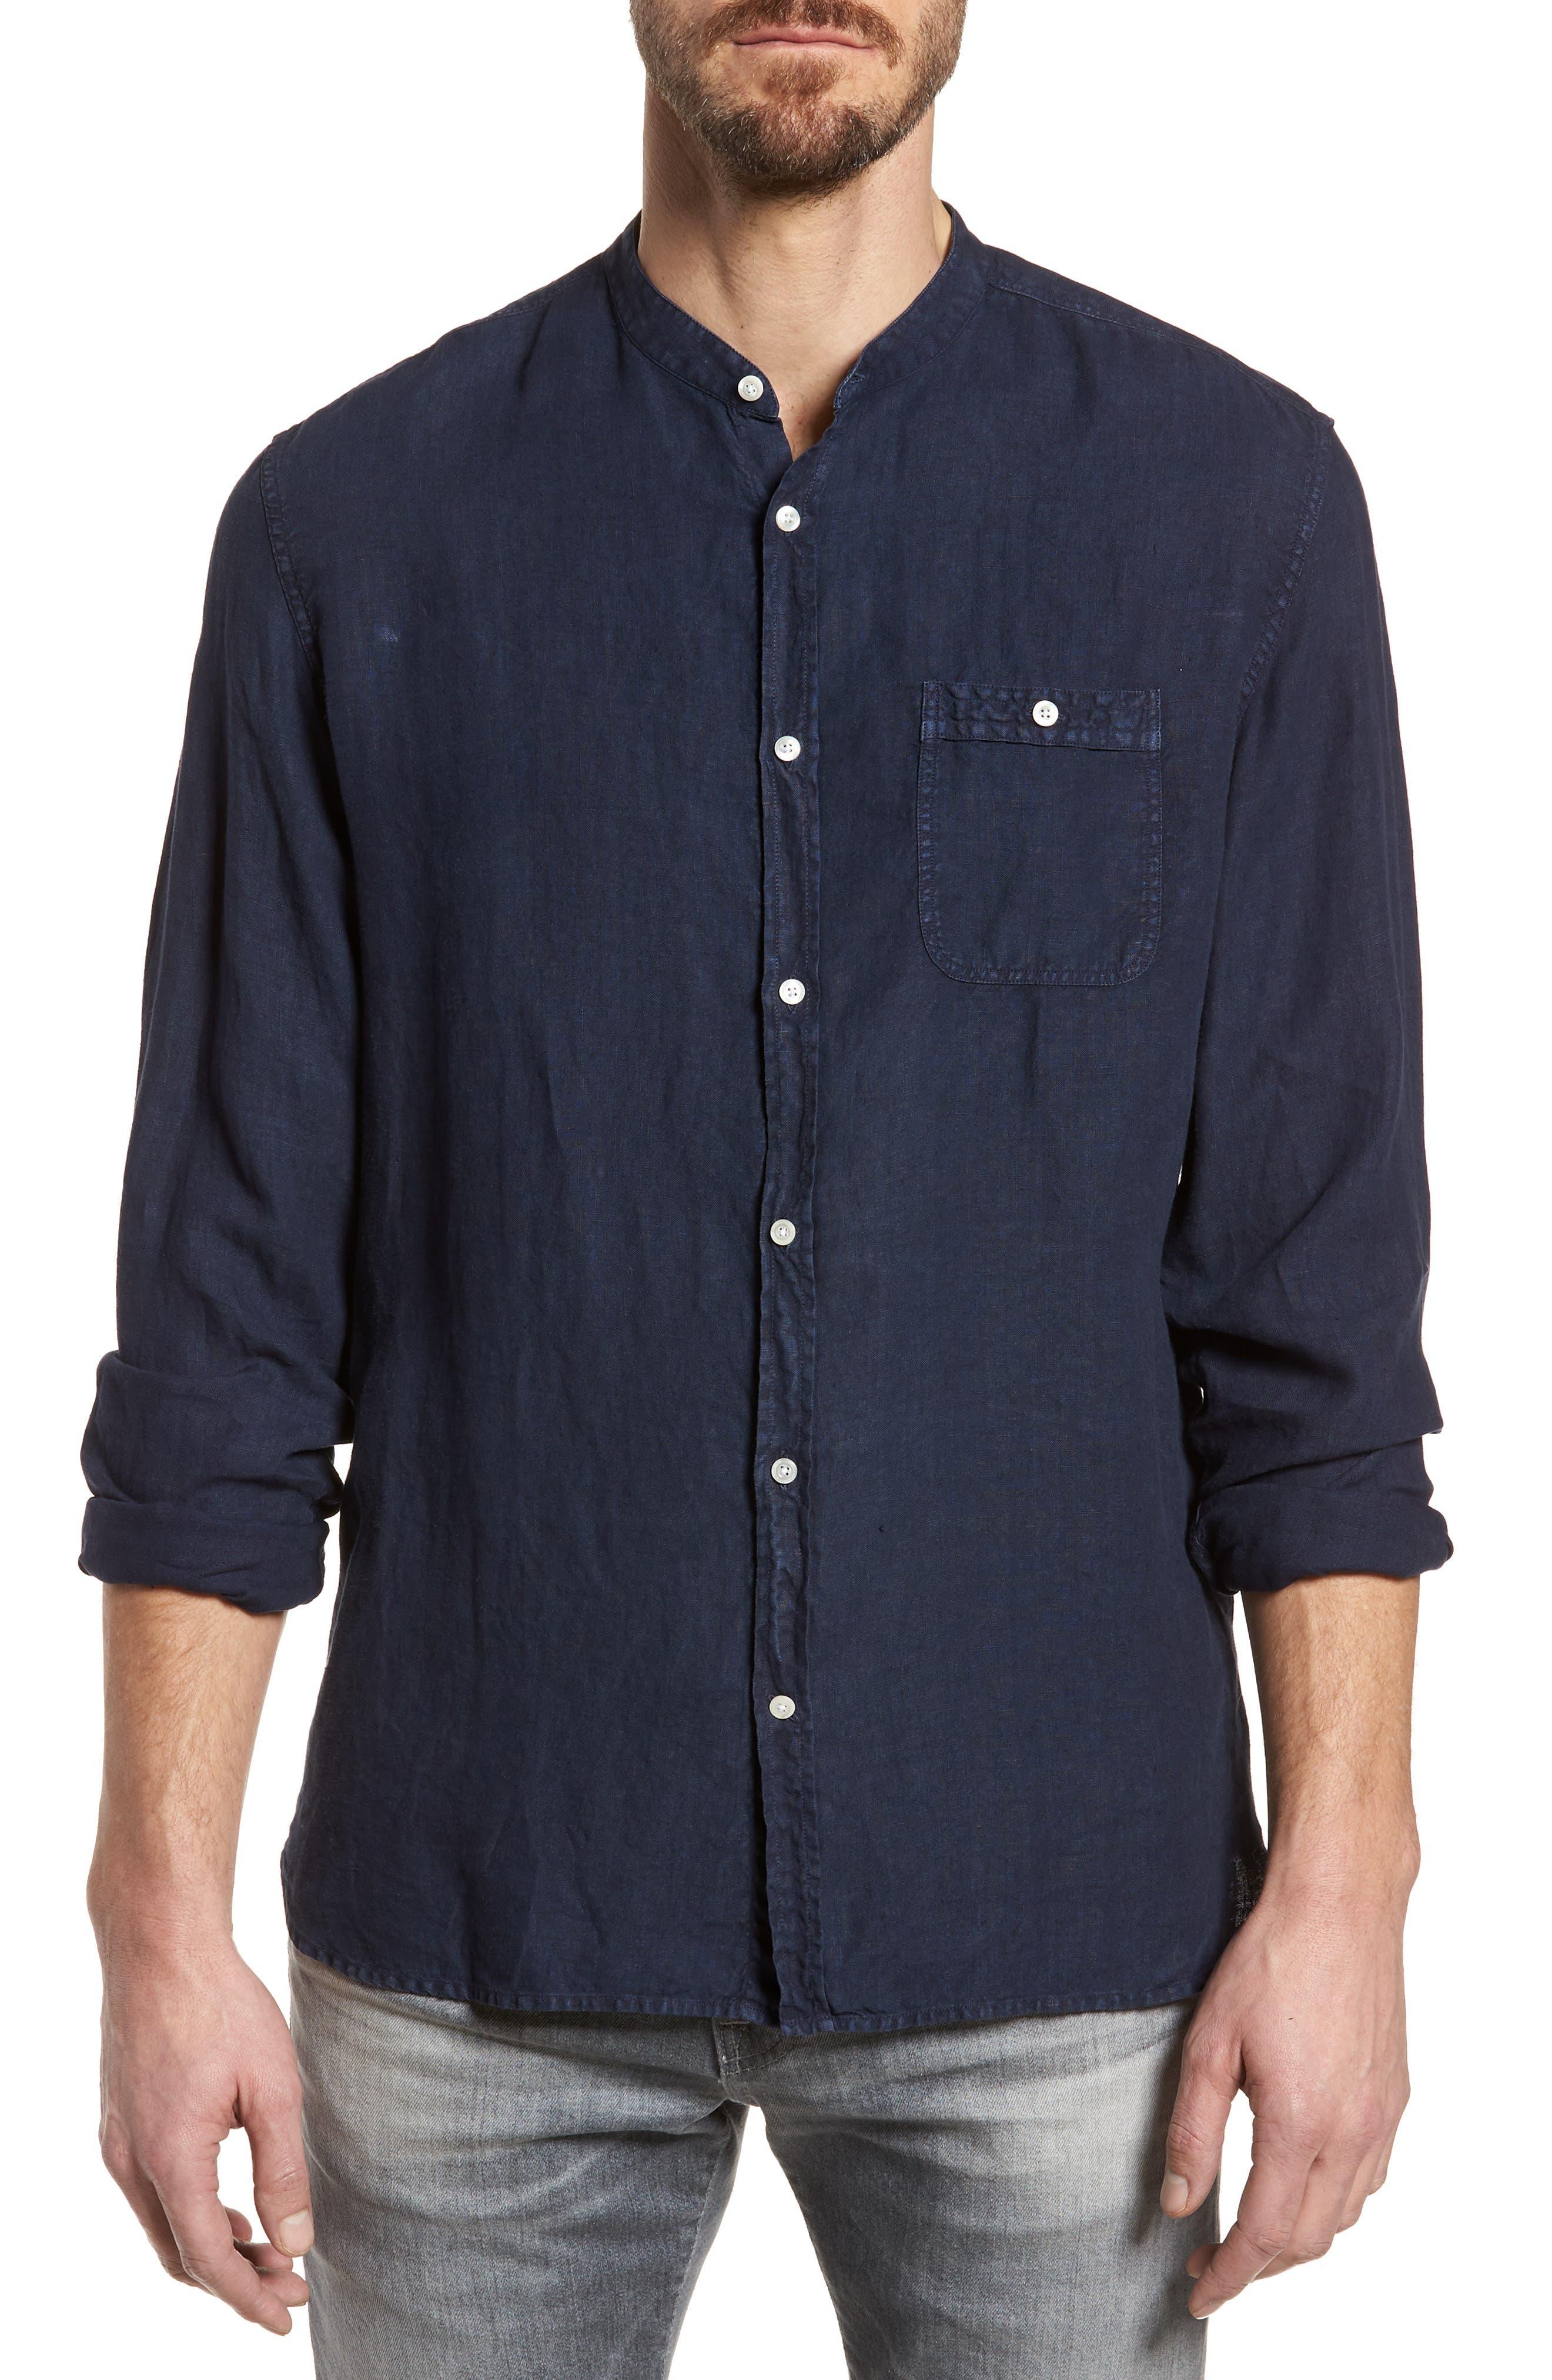 & Bros. Regular Fit Band Collar Linen Shirt,                             Main thumbnail 1, color,                             477